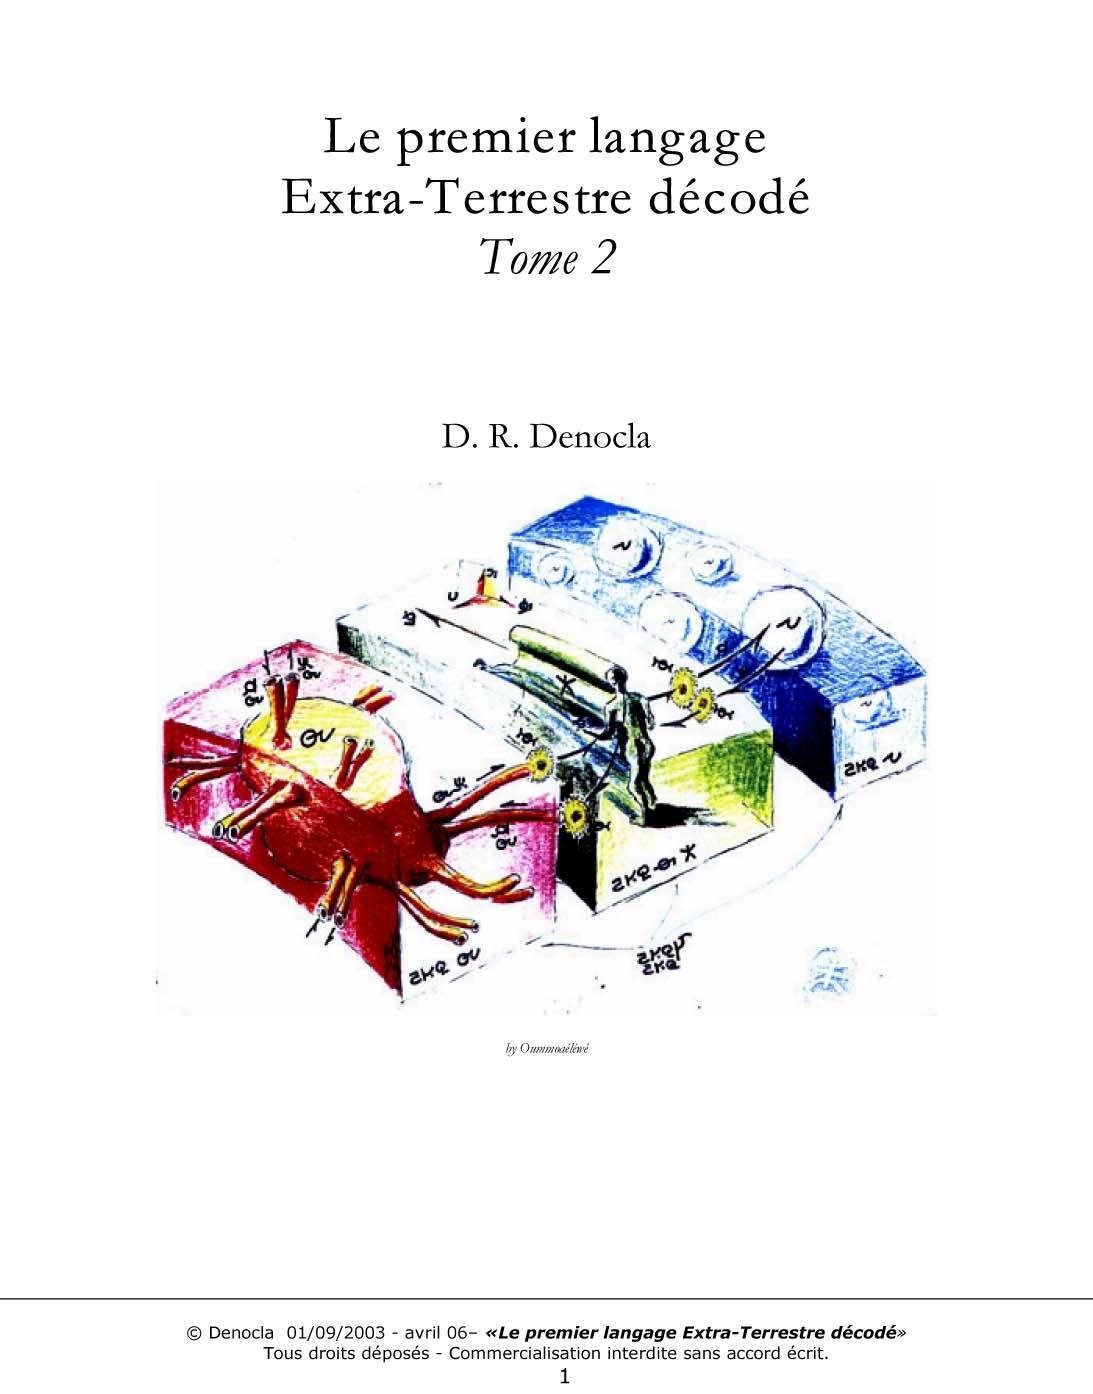 Microsoft Word - Denocla-T2-langage-Oummain-10042006.doc